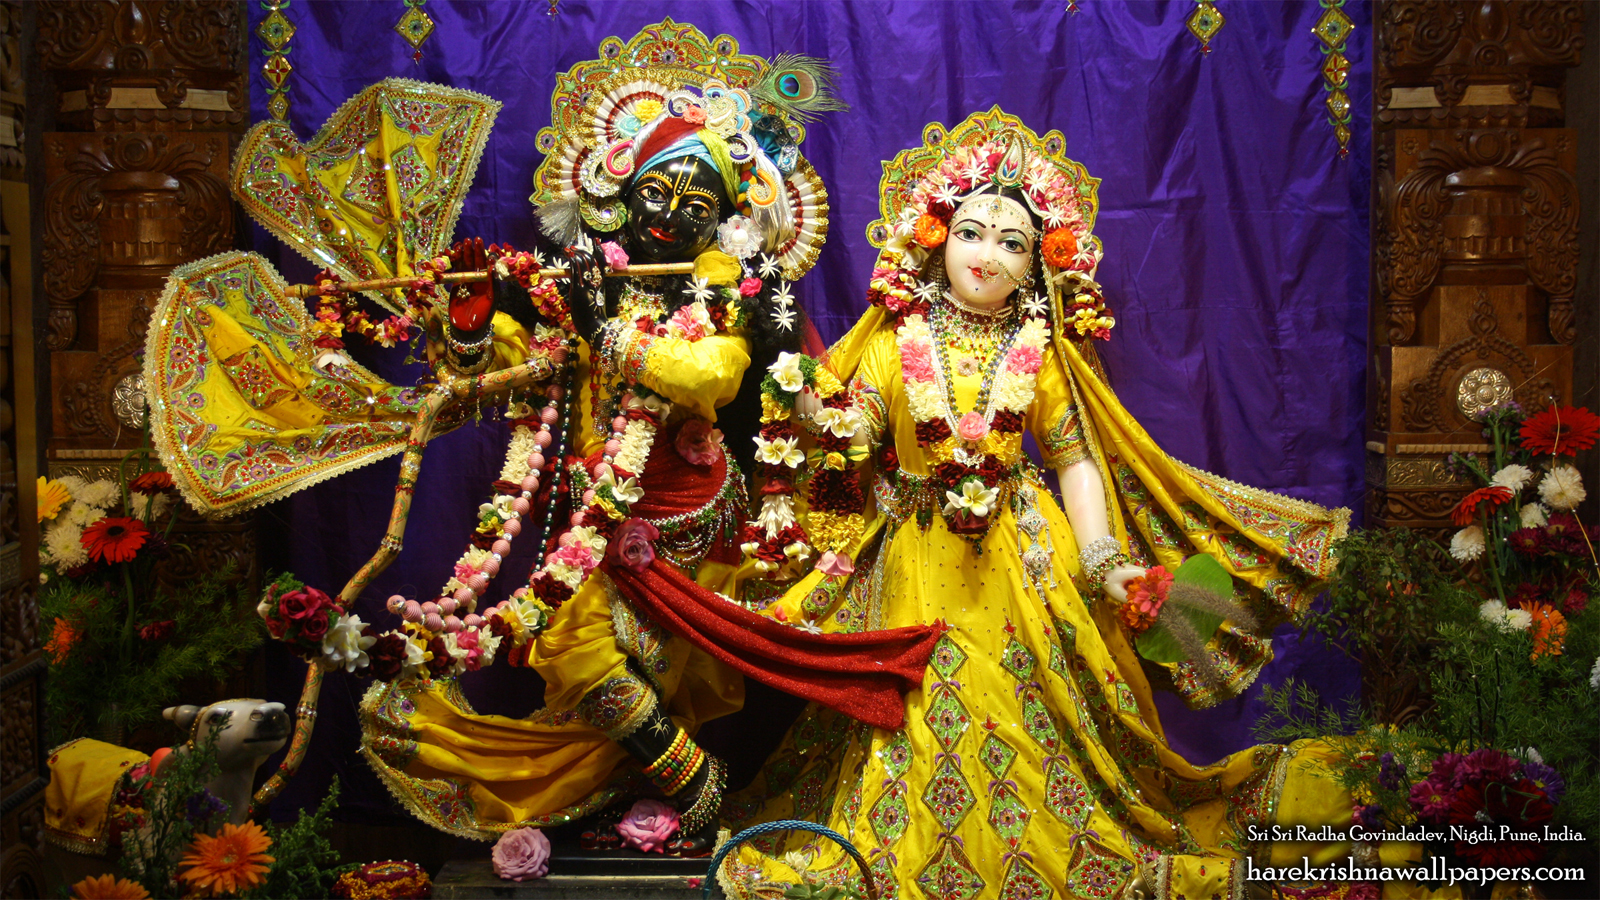 Sri Sri Radha Govind Wallpaper (028) Size 1600x900 Download